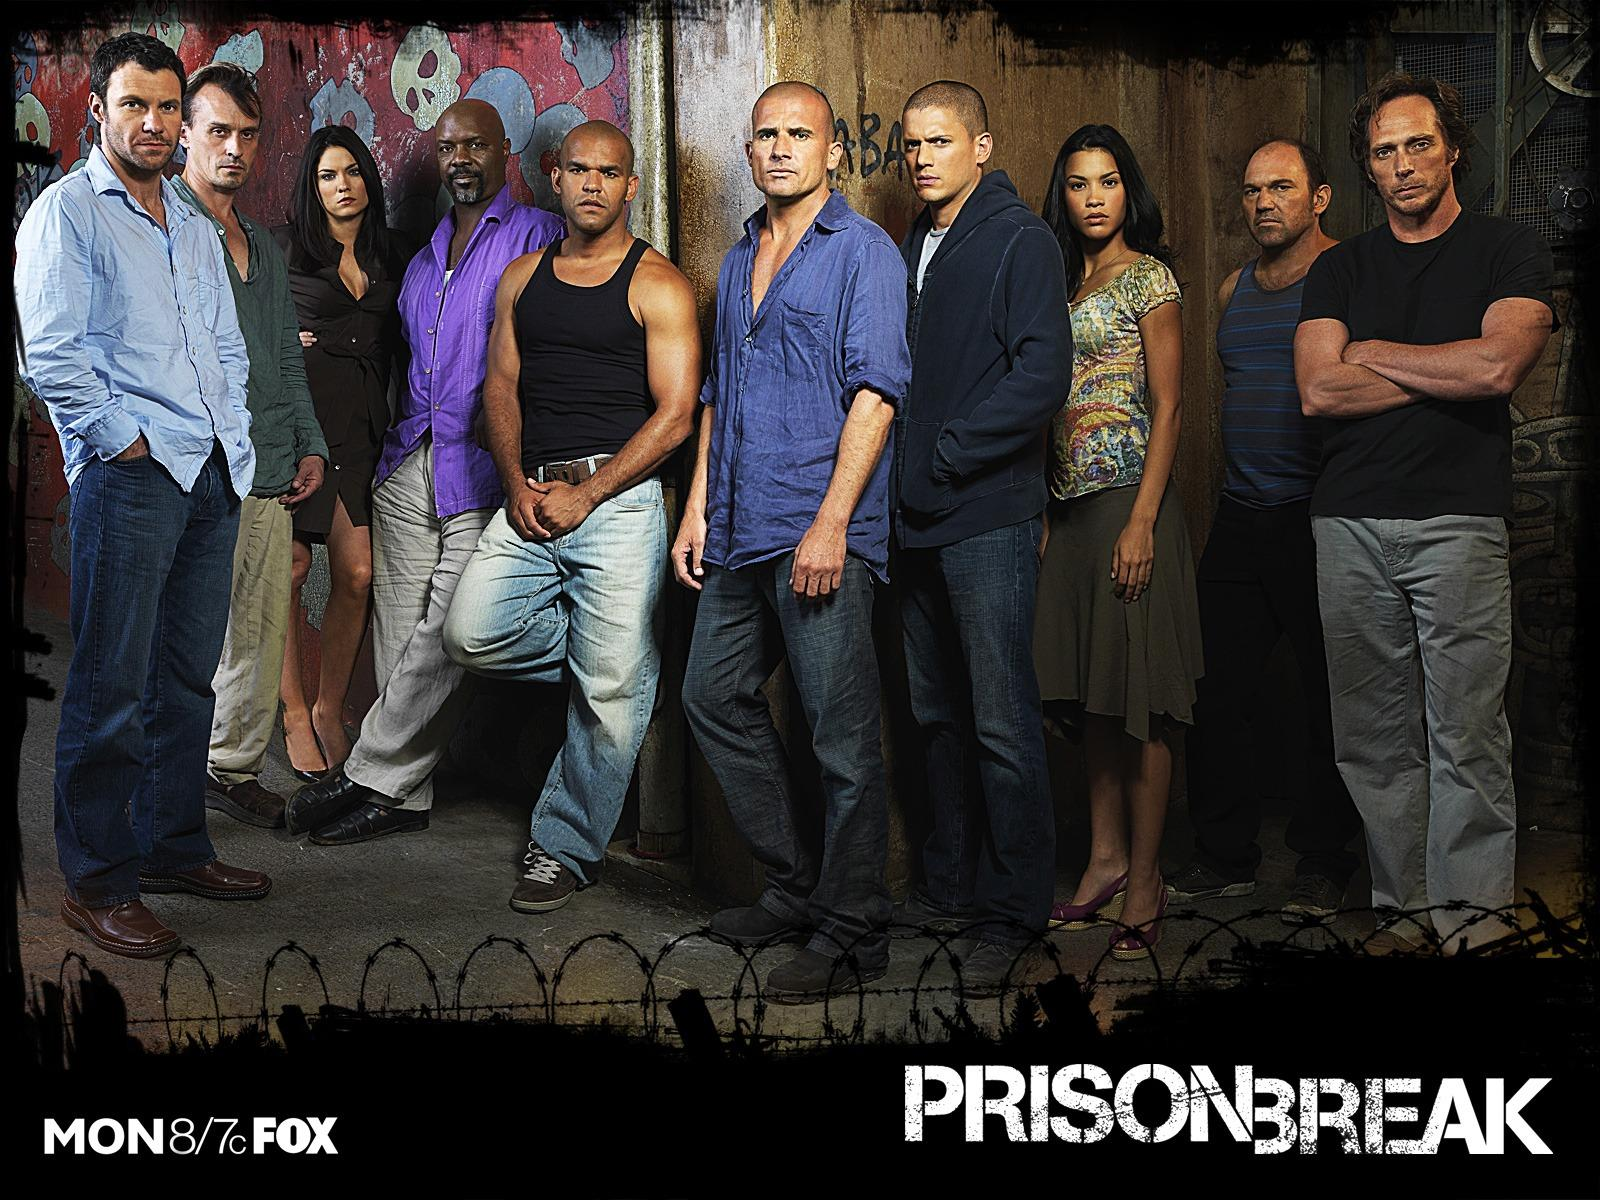 Prison break wallpapers prison break wallpaper wallpapers download 1600x1200